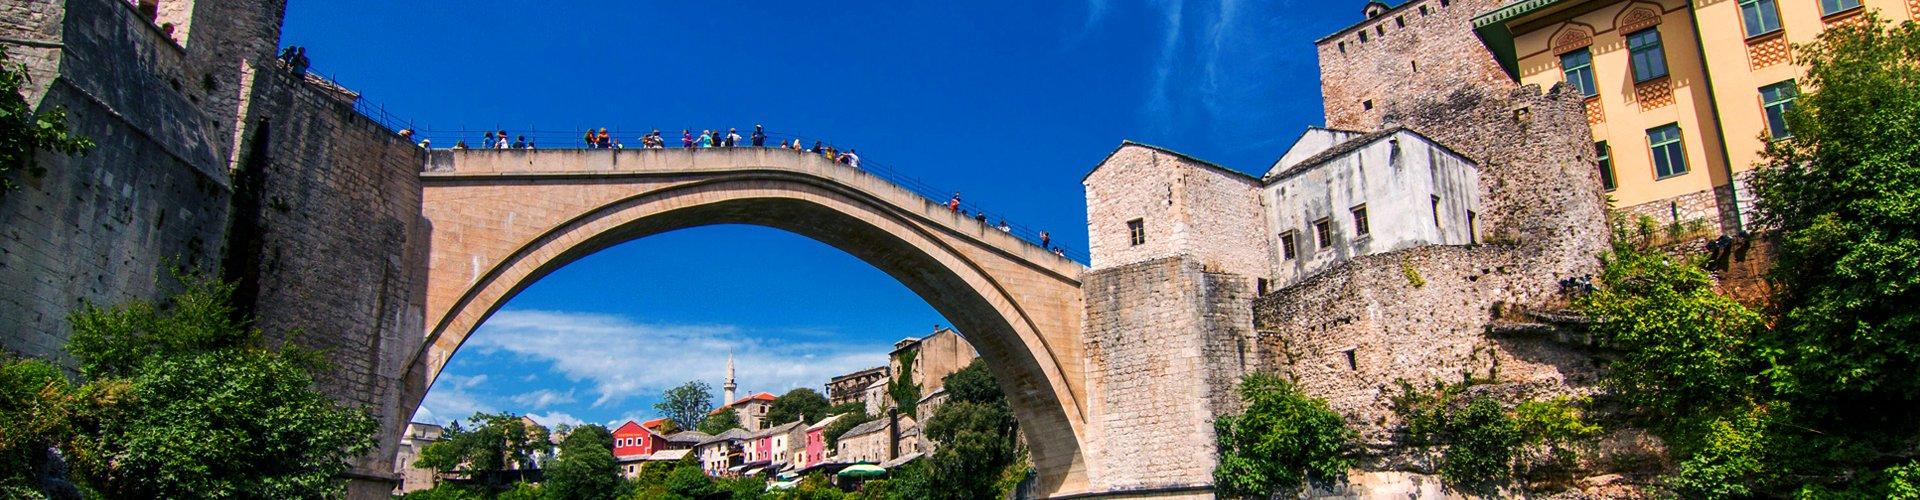 Brug van Mostar in Bosnië